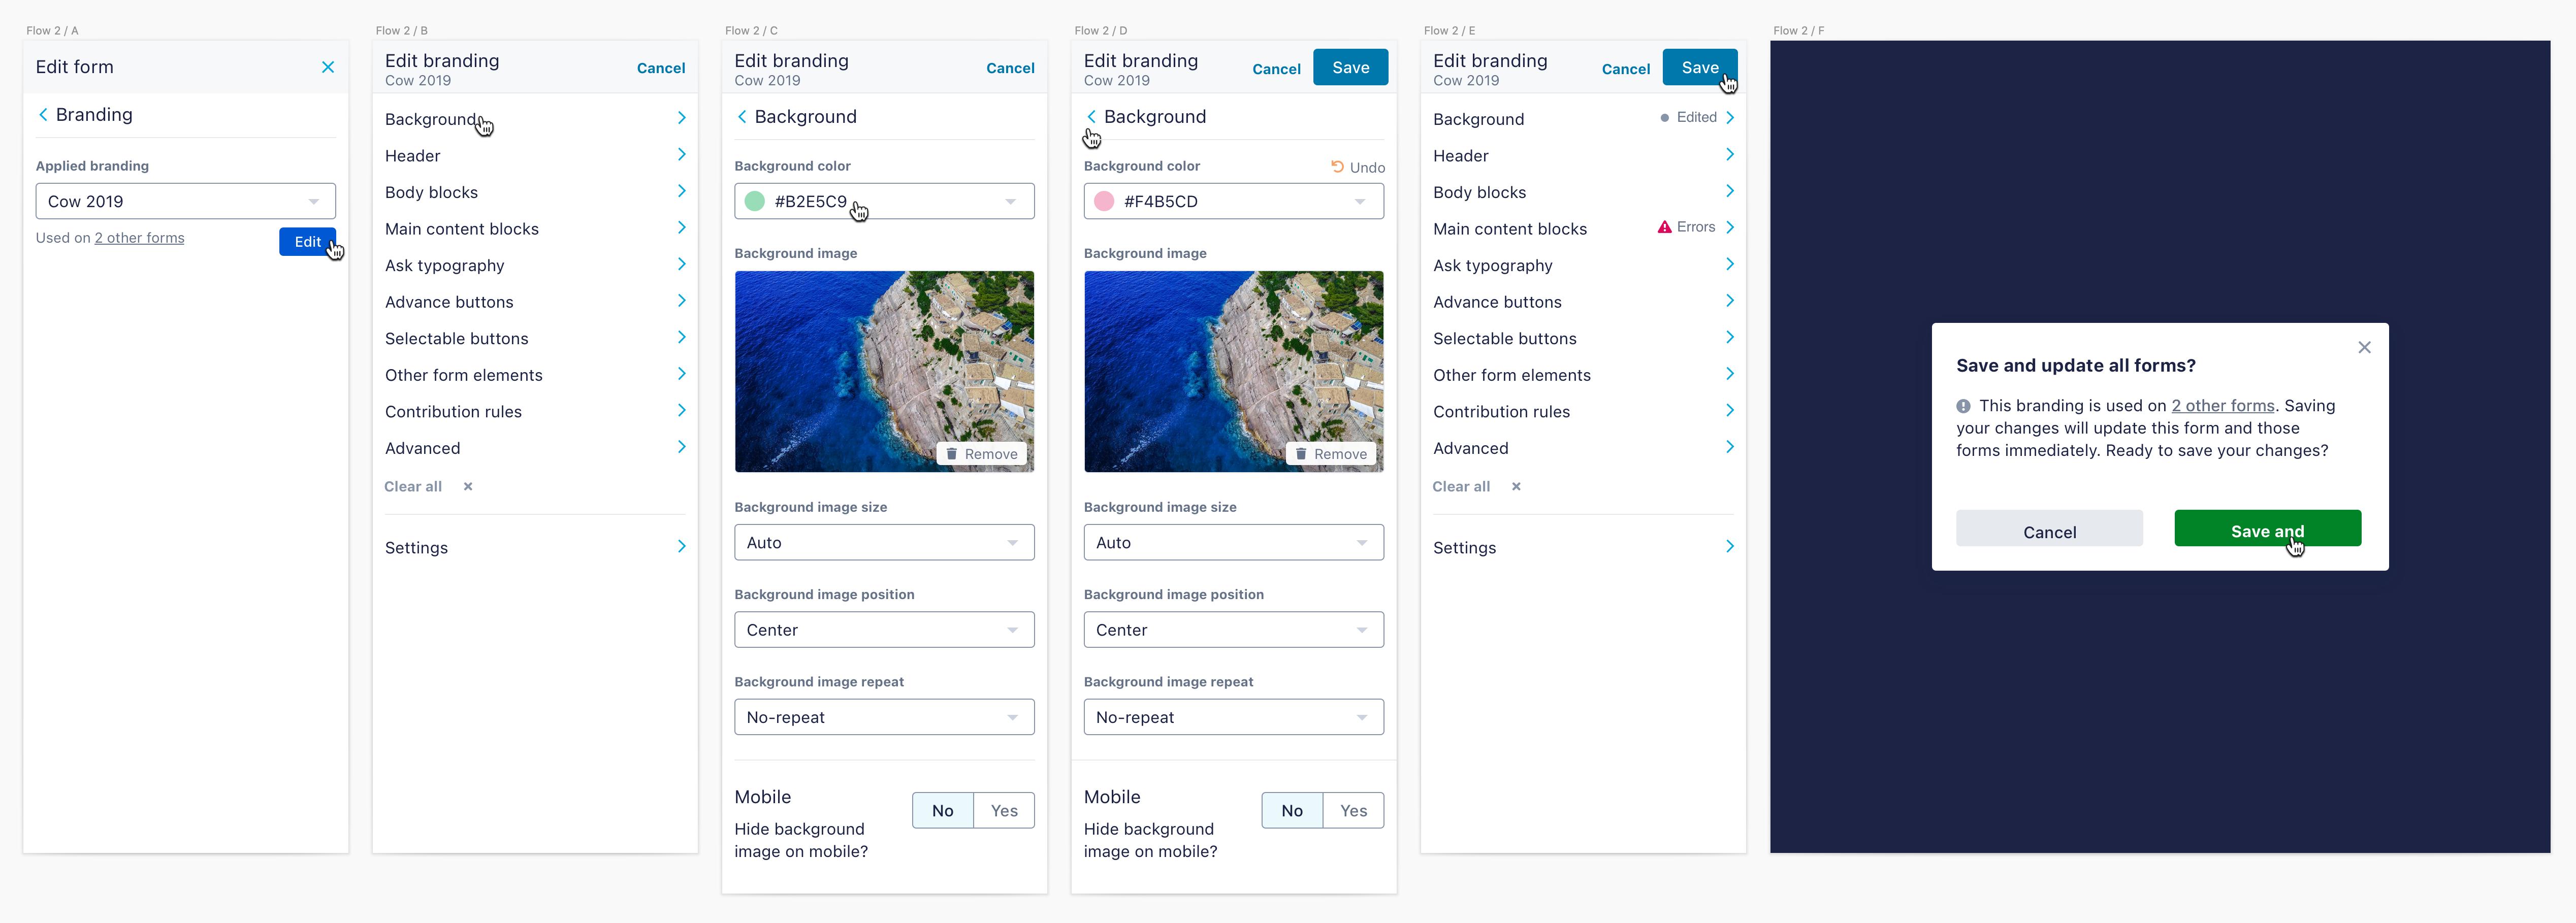 a screenshot of UI for editing an existing branding